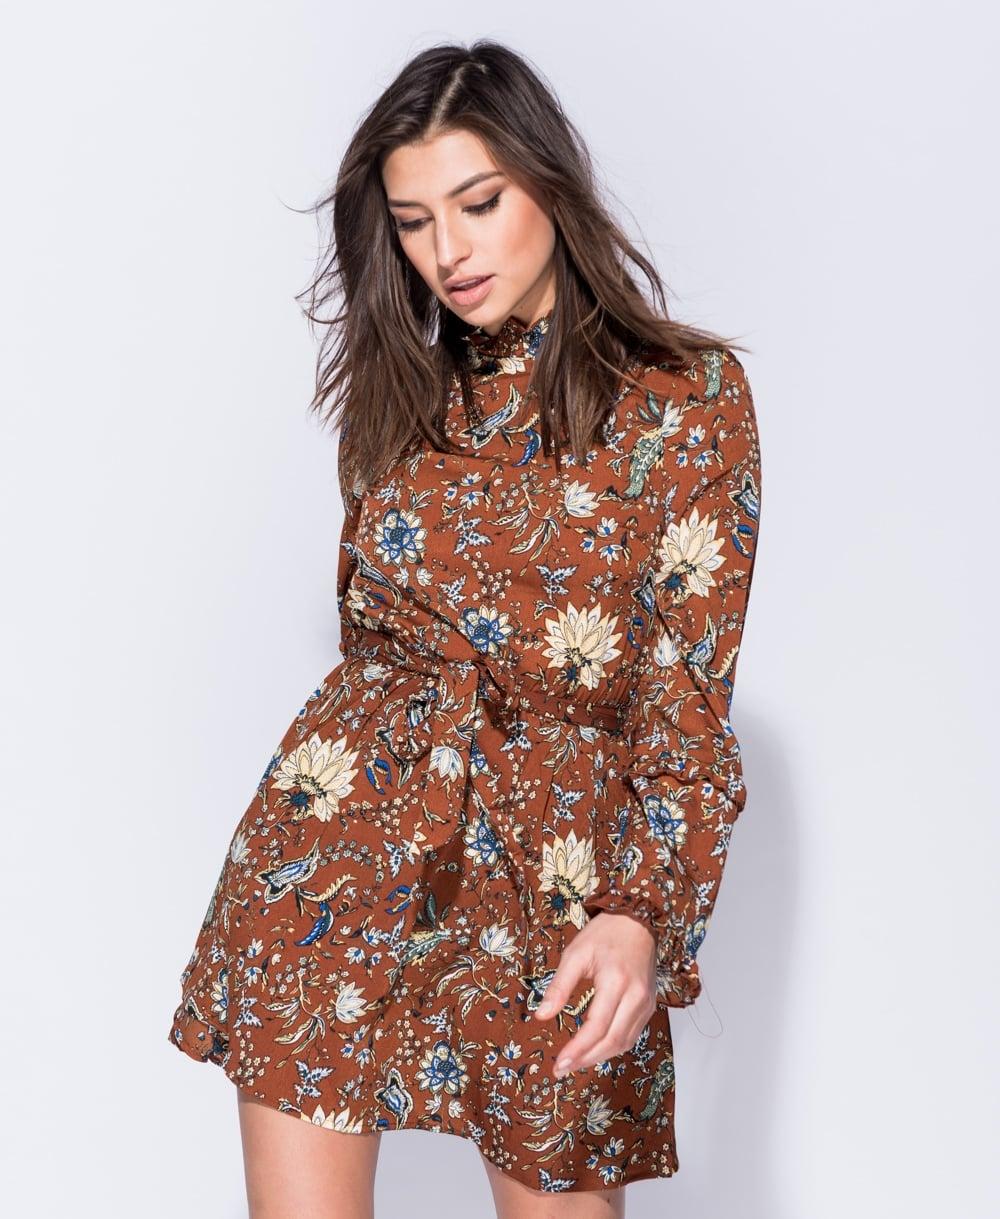 6e0a4bbcb0e0 boho 70s floral mini φόρεμα τουνίκ Cora